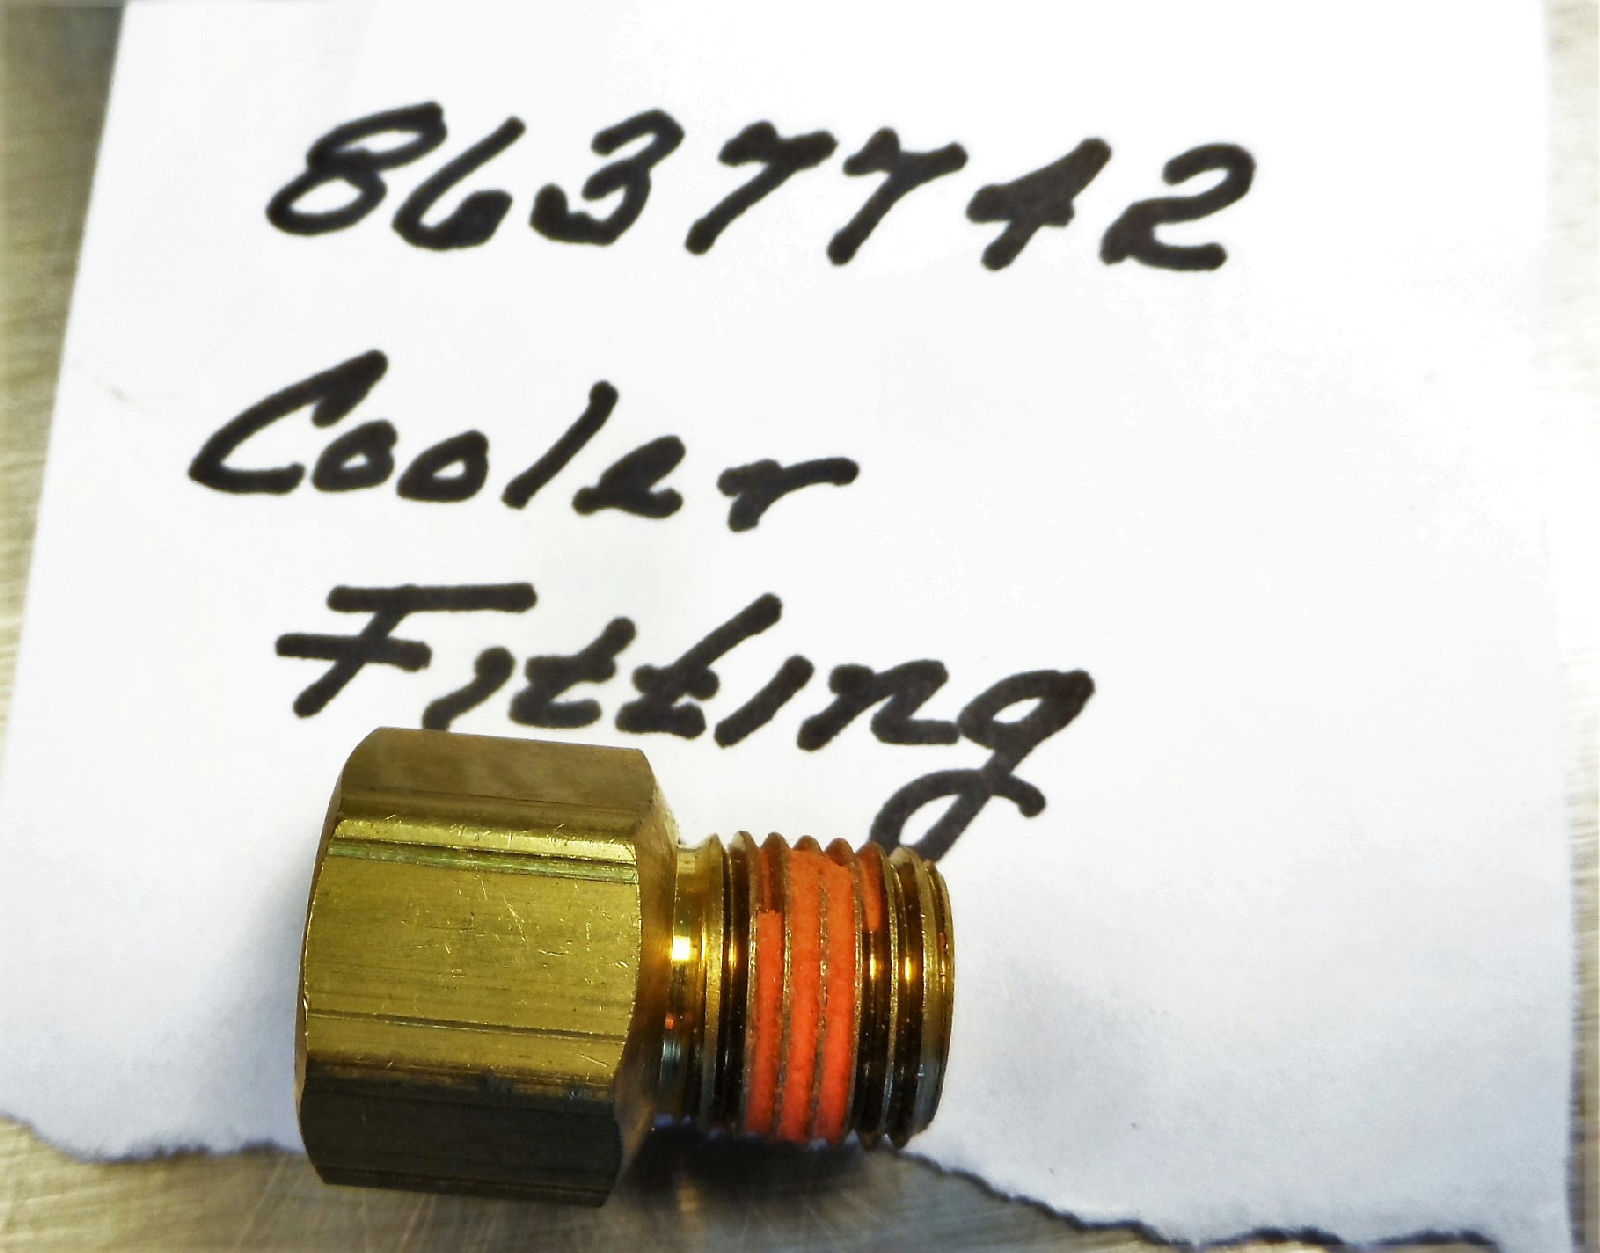 GM ACDelco Original 8637742 Cooler Fitting General Motors New image 2